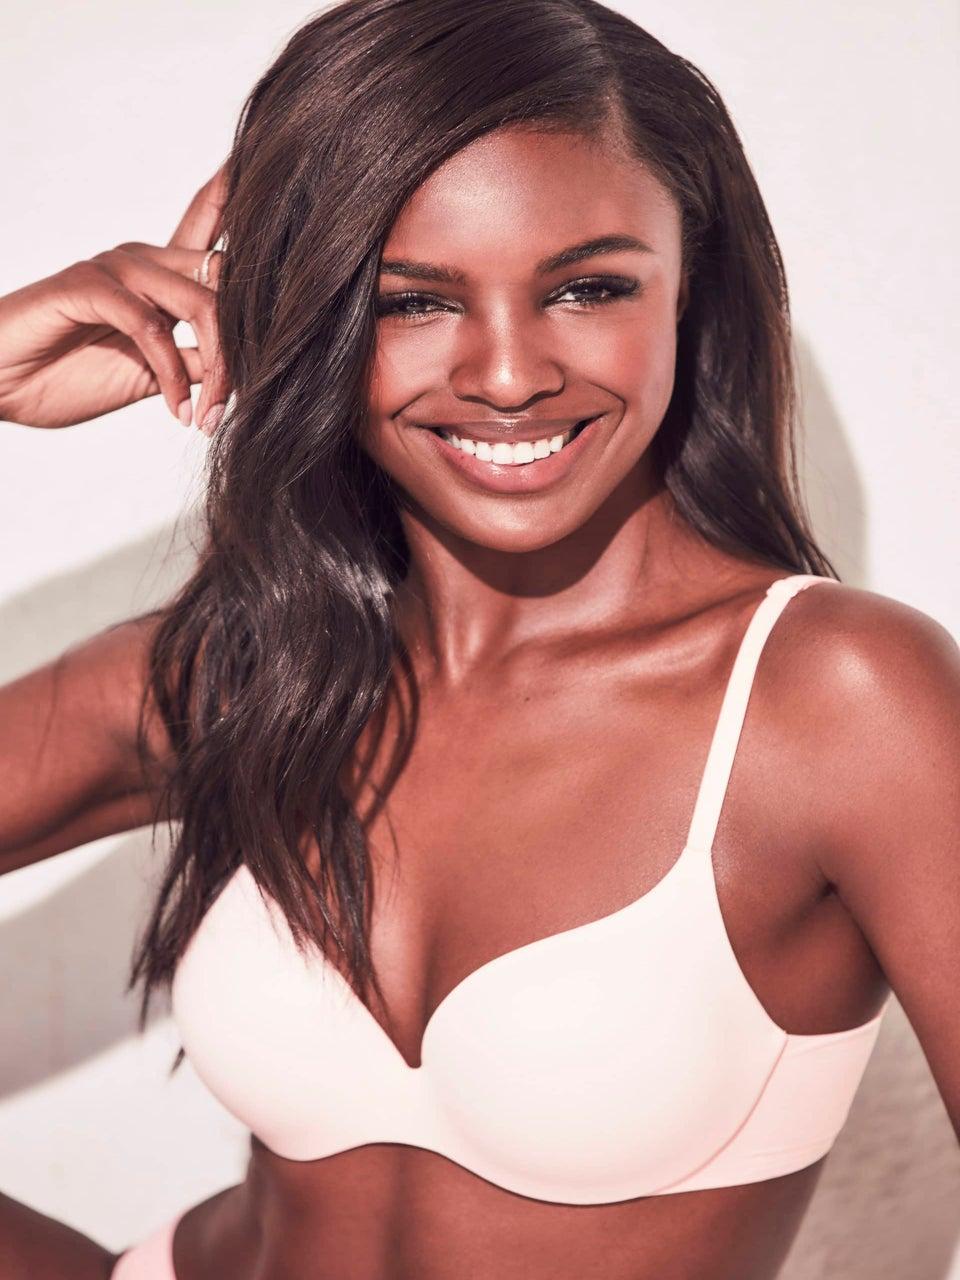 British Model Leomie Anderson Is #Goals As Victoria's Secret's New 'Angel'